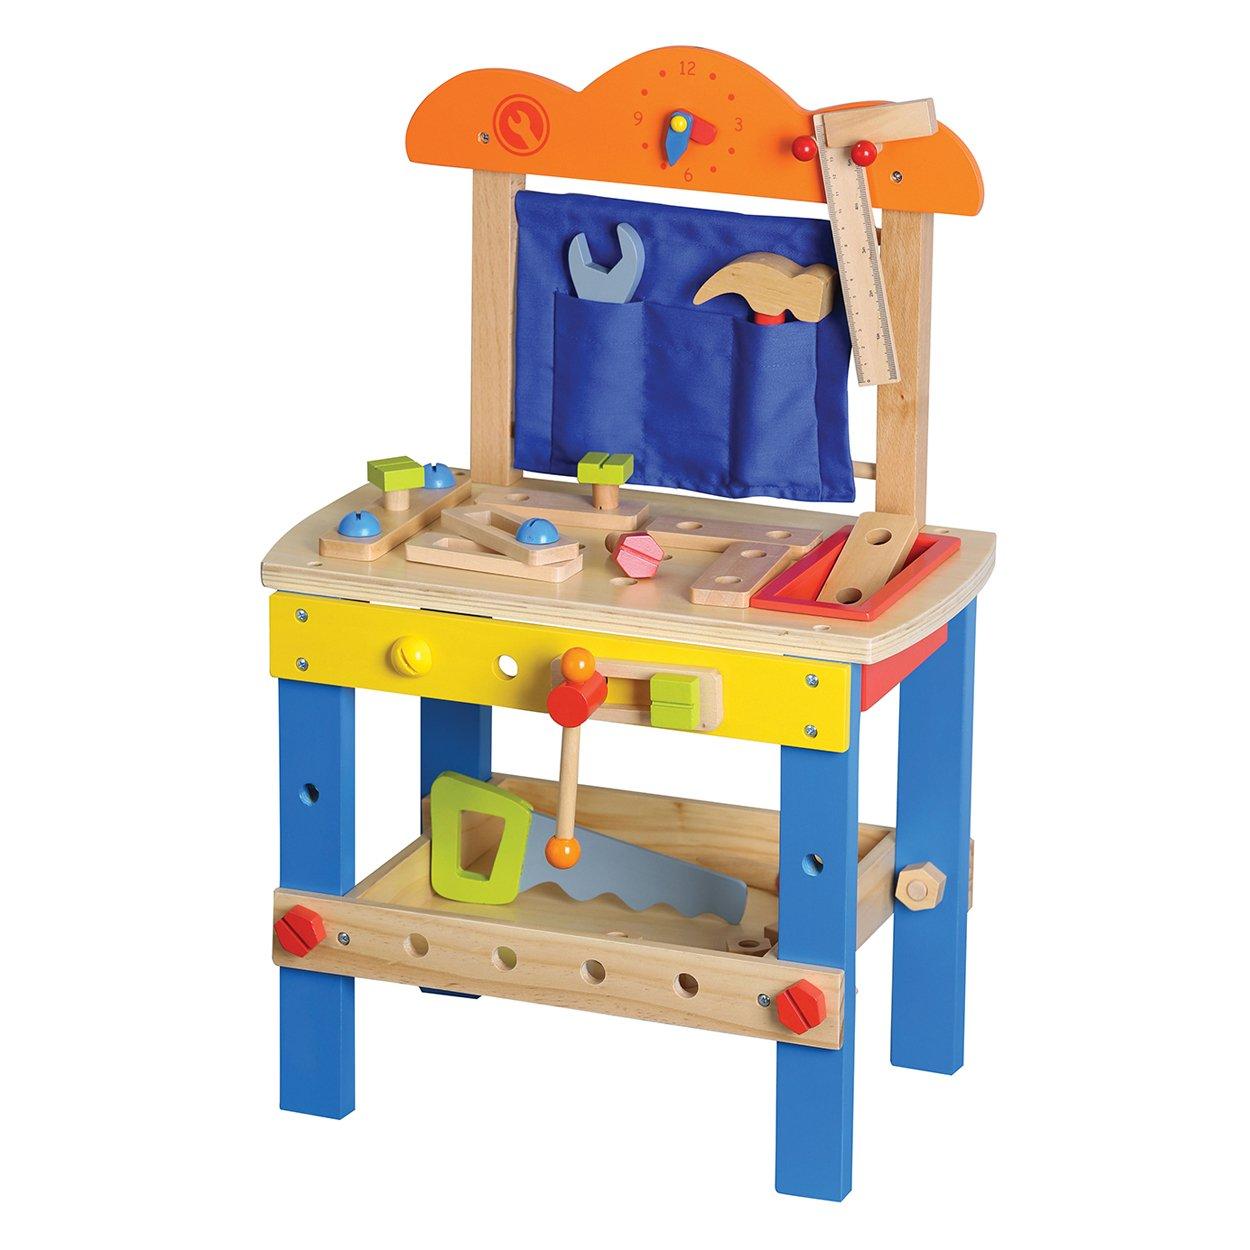 LELIN Wooden Childrens DIY Builder Carpentry Construction Work Bench Set 49 pieces